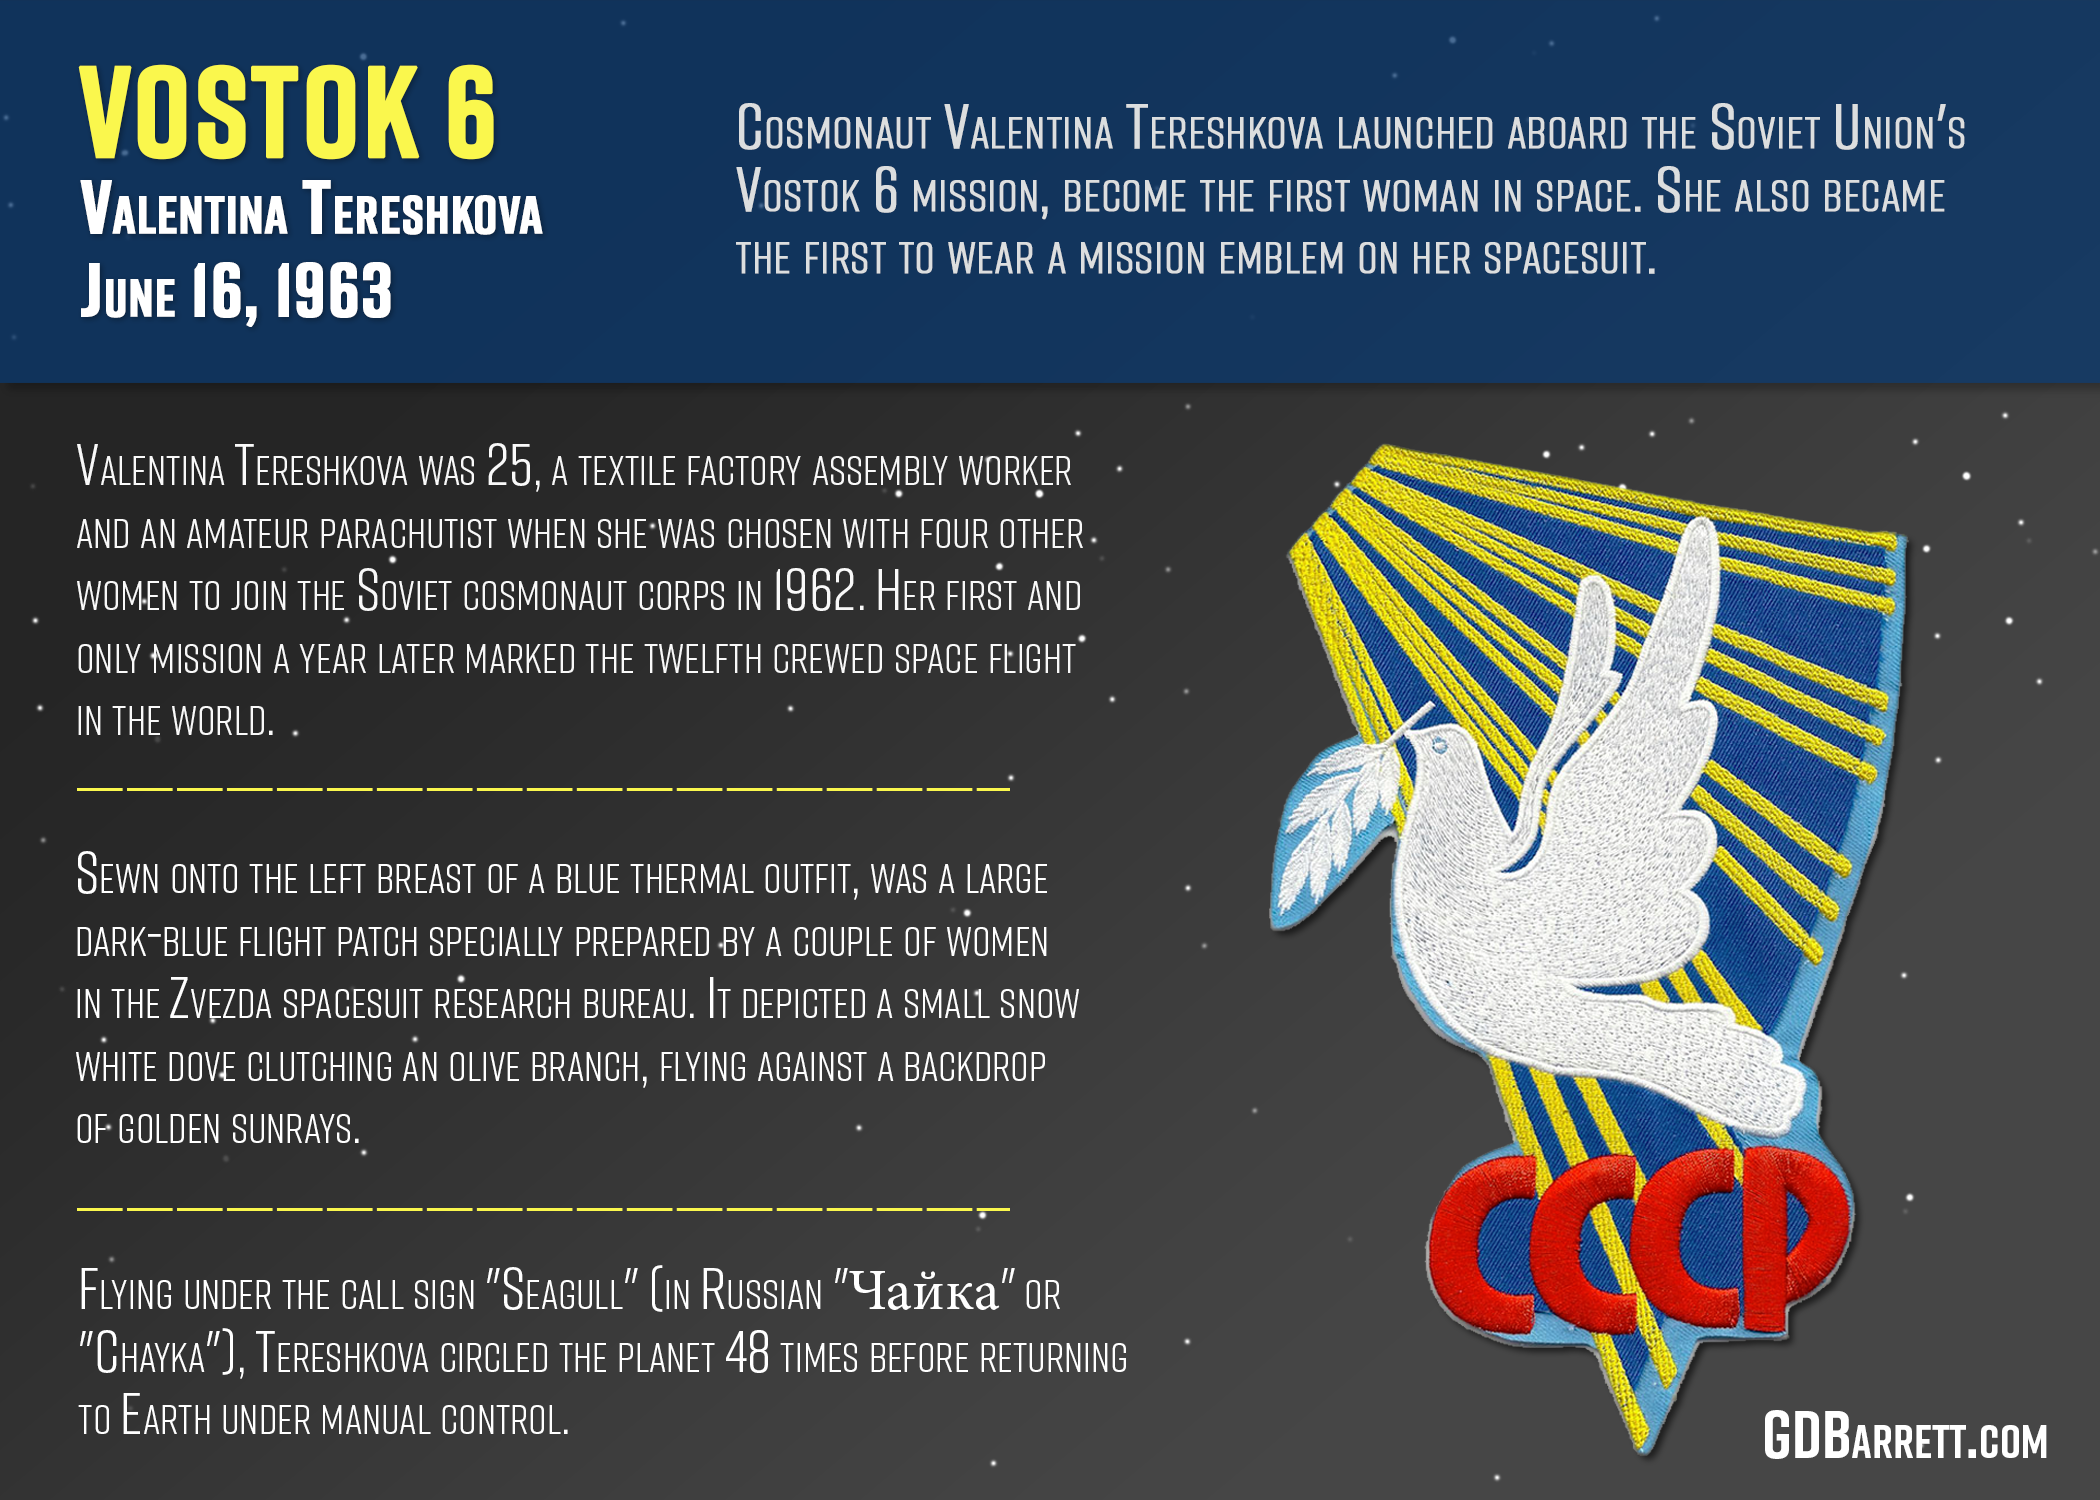 Vostok 6 - Valentina Tereshkova